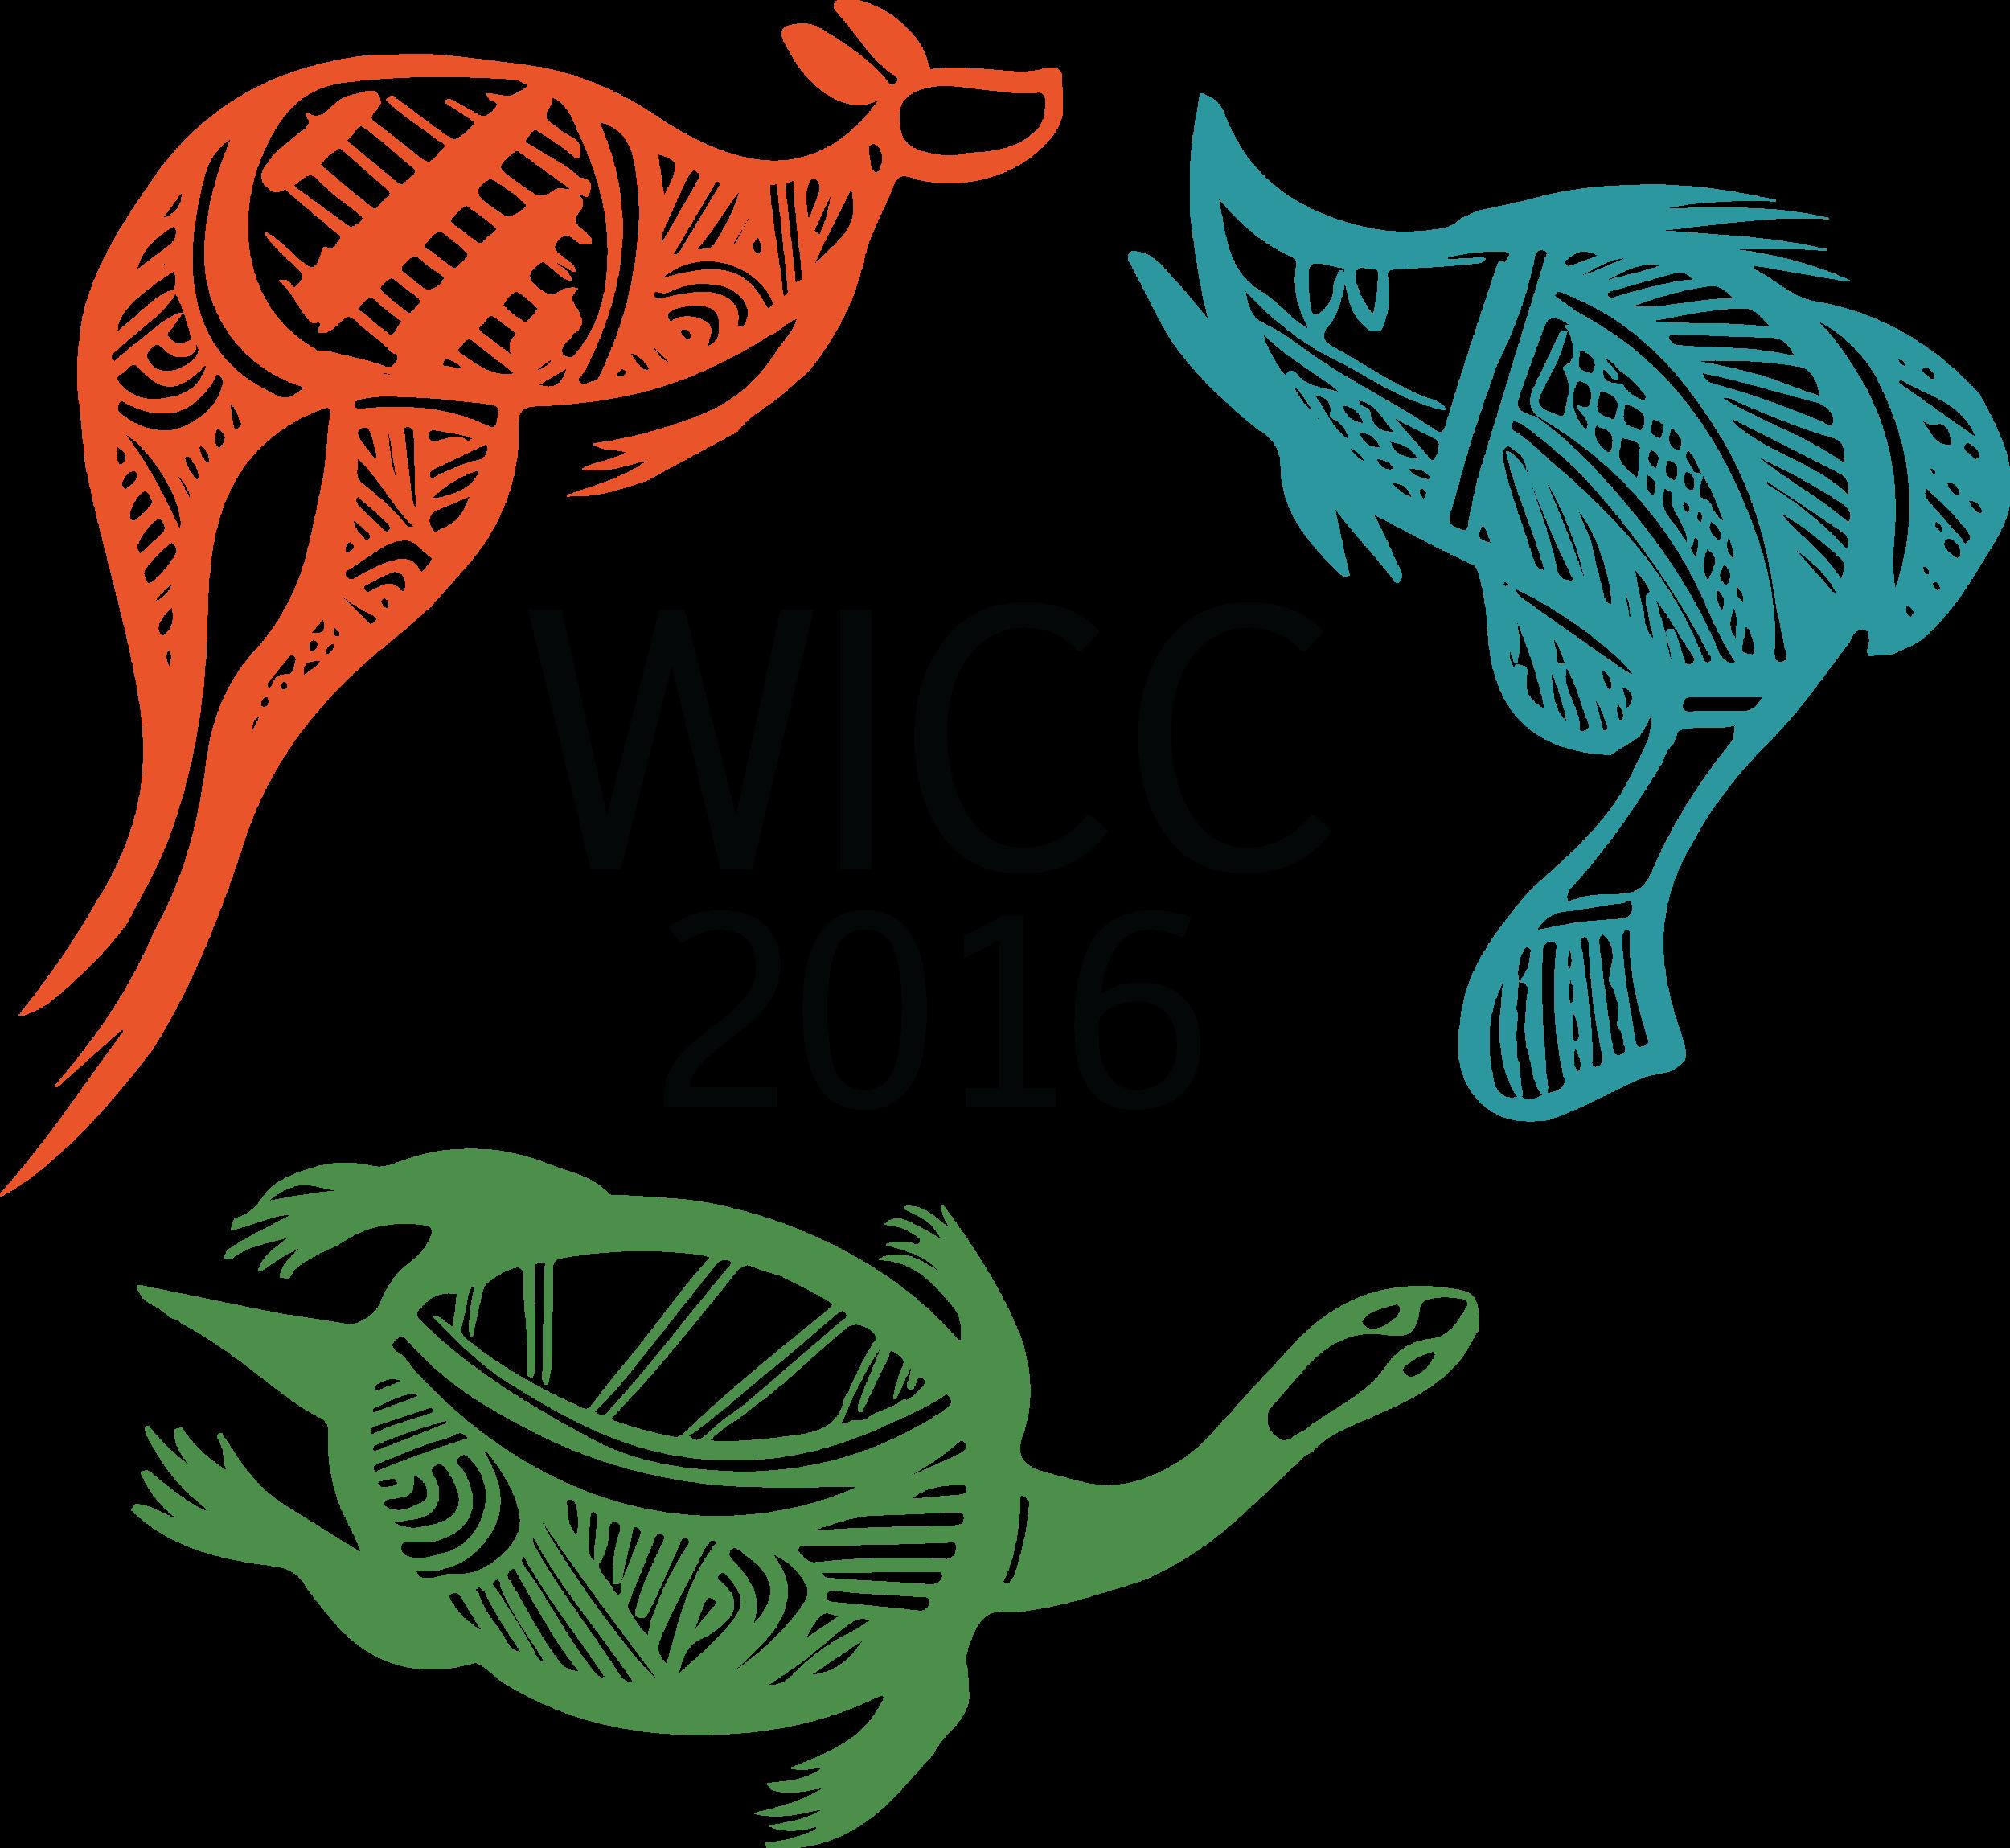 WICC_2016_LOGO_FINAL.png